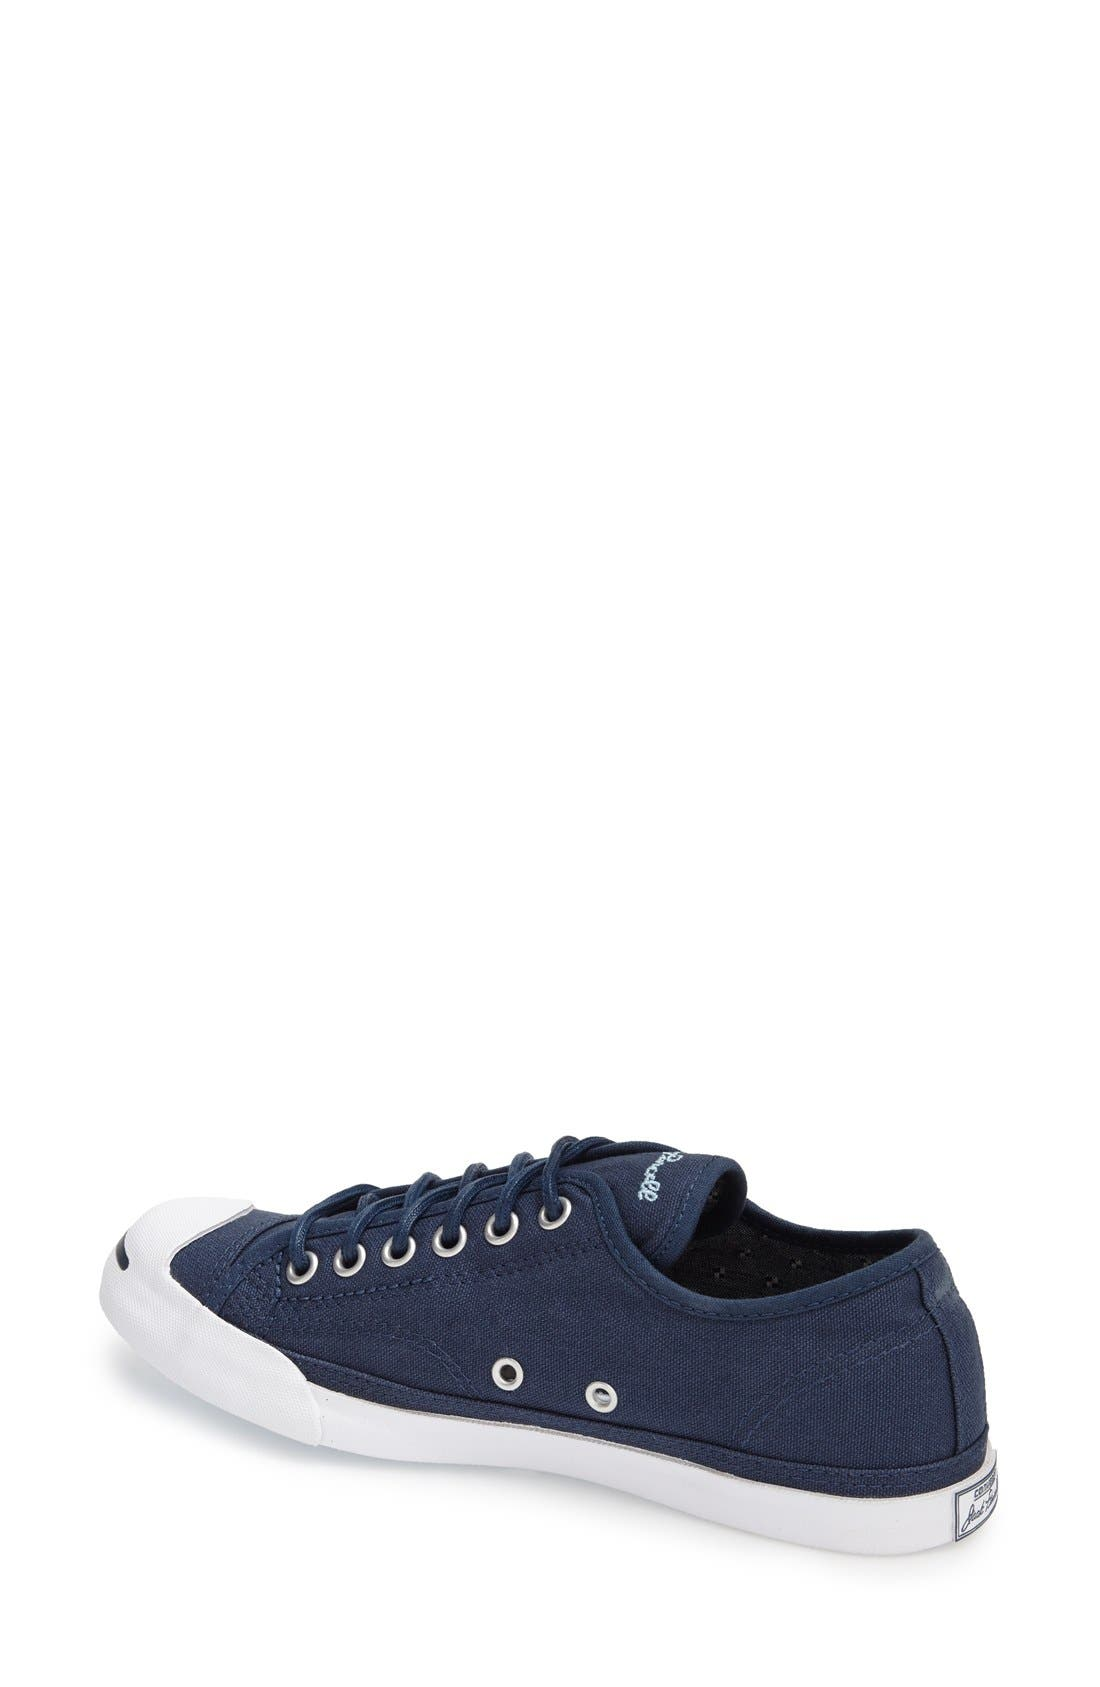 'Jack Purcell' Low Top Slip On Sneaker,                             Alternate thumbnail 2, color,                             Navy/ Blue/ White